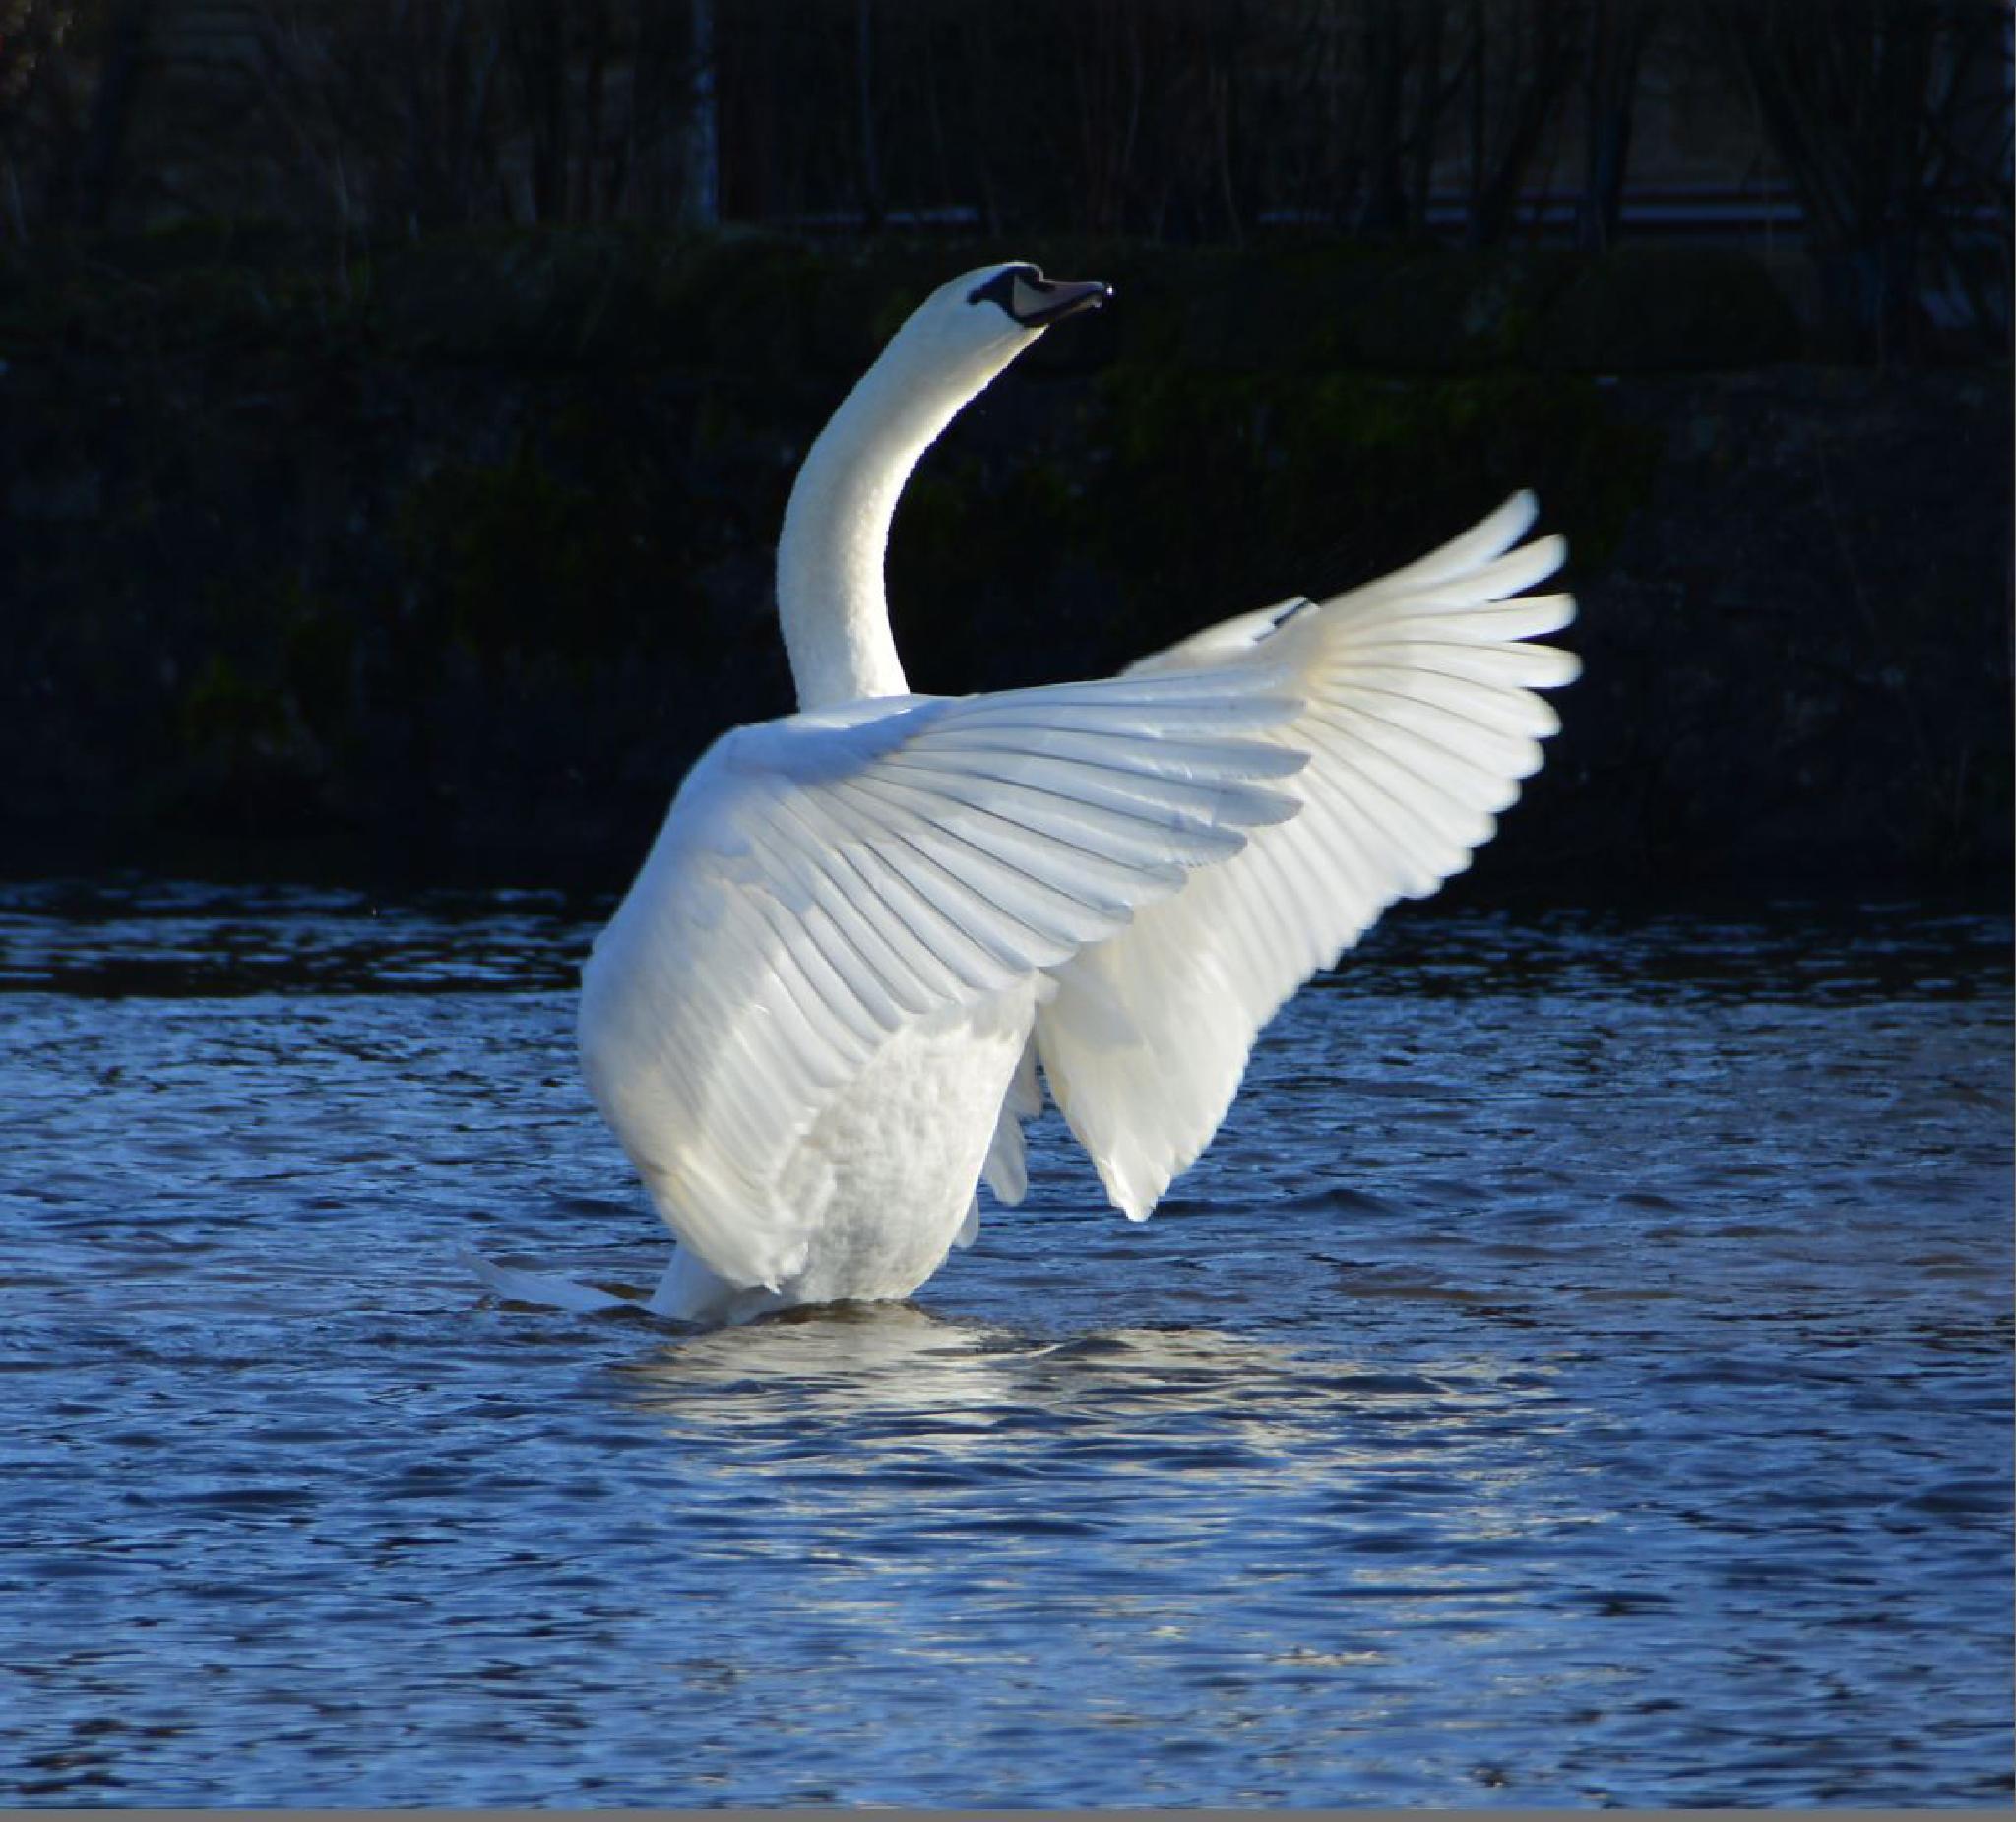 Dancing Swan by vincent mcnutt